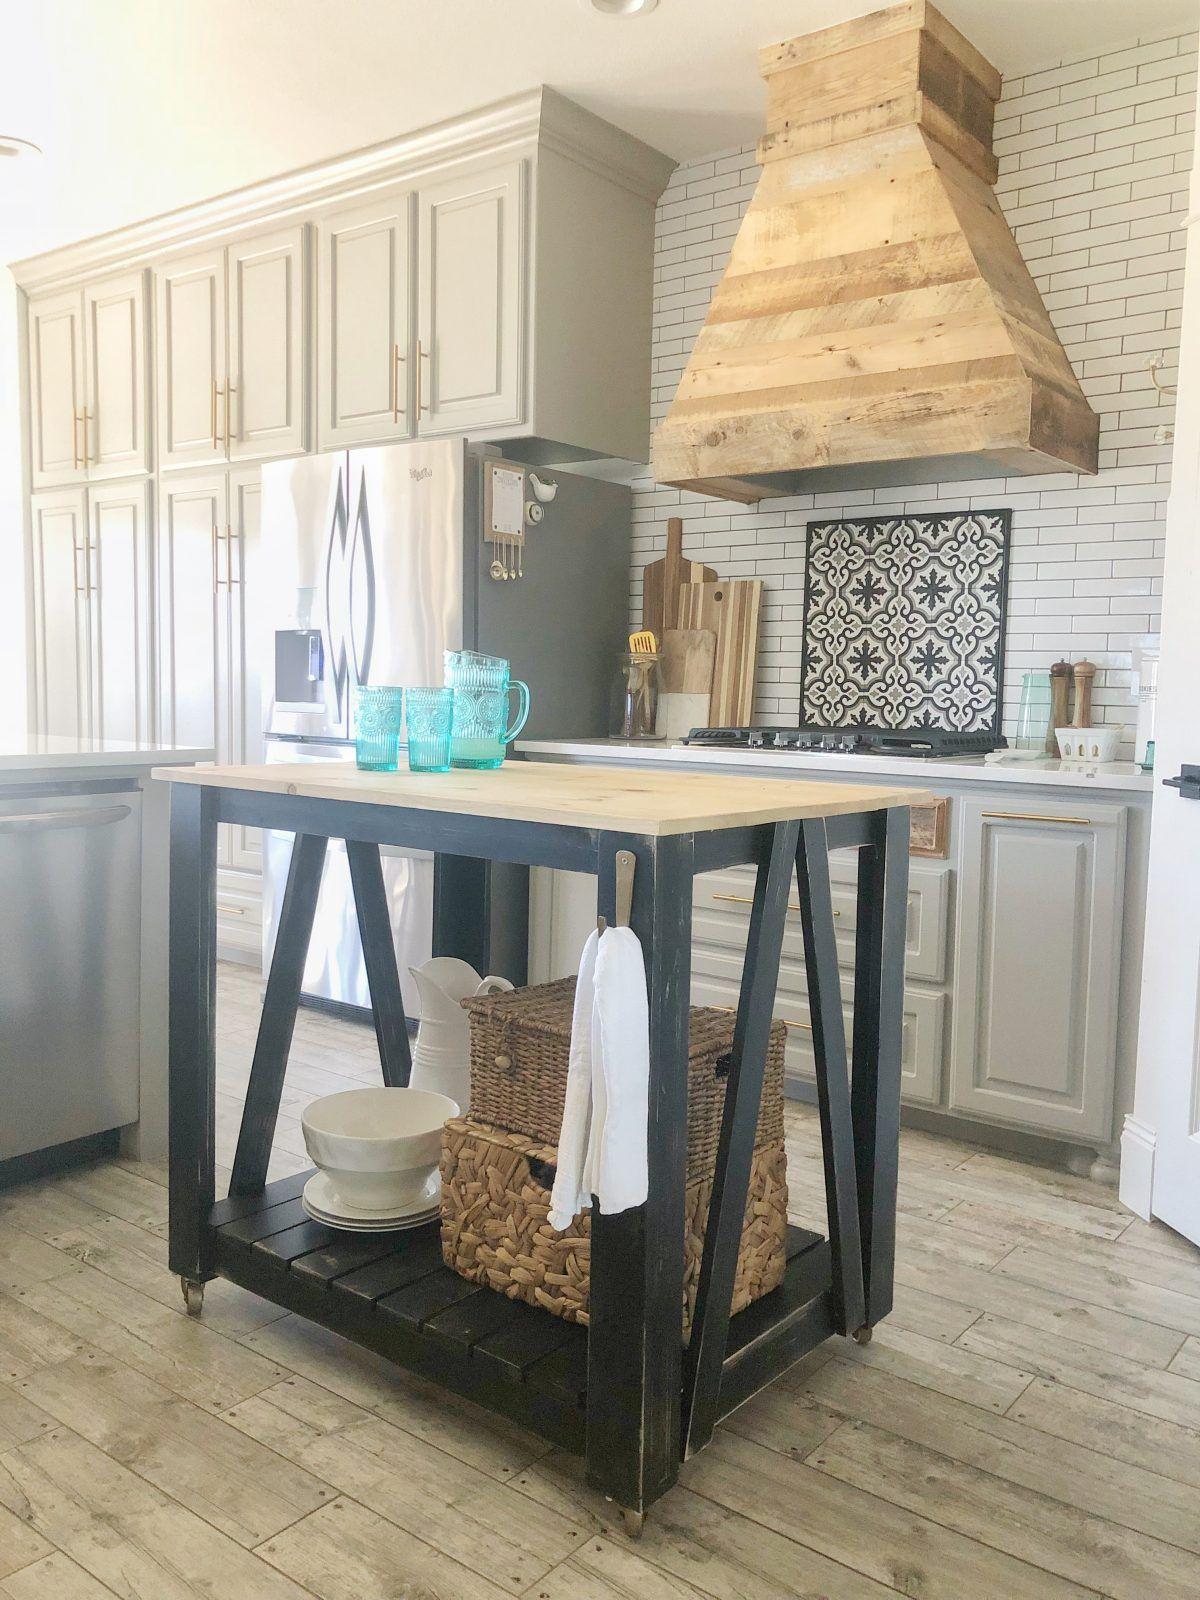 Diy Modern Farmhouse Kitchen Cart Free Plans By Shanty2chic